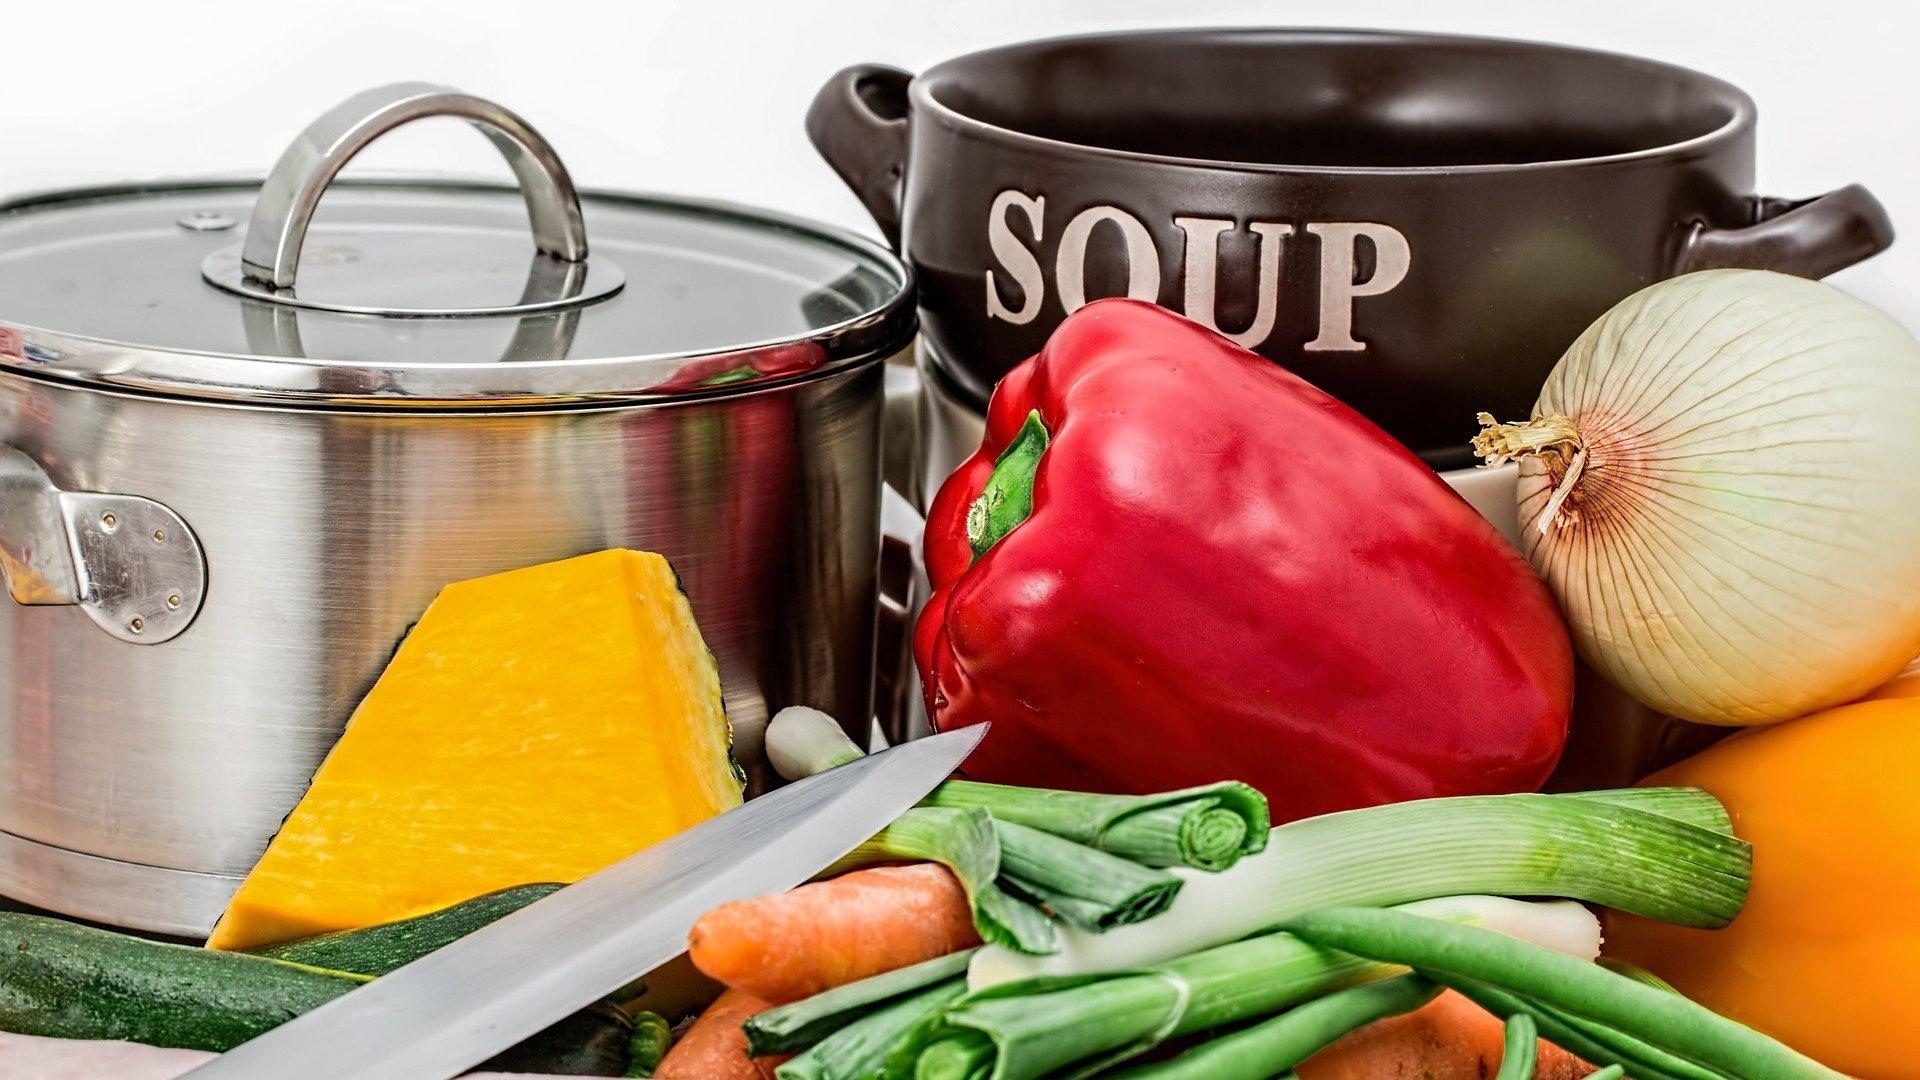 Suppentopf, Suppenschüssel, Suppengemüse